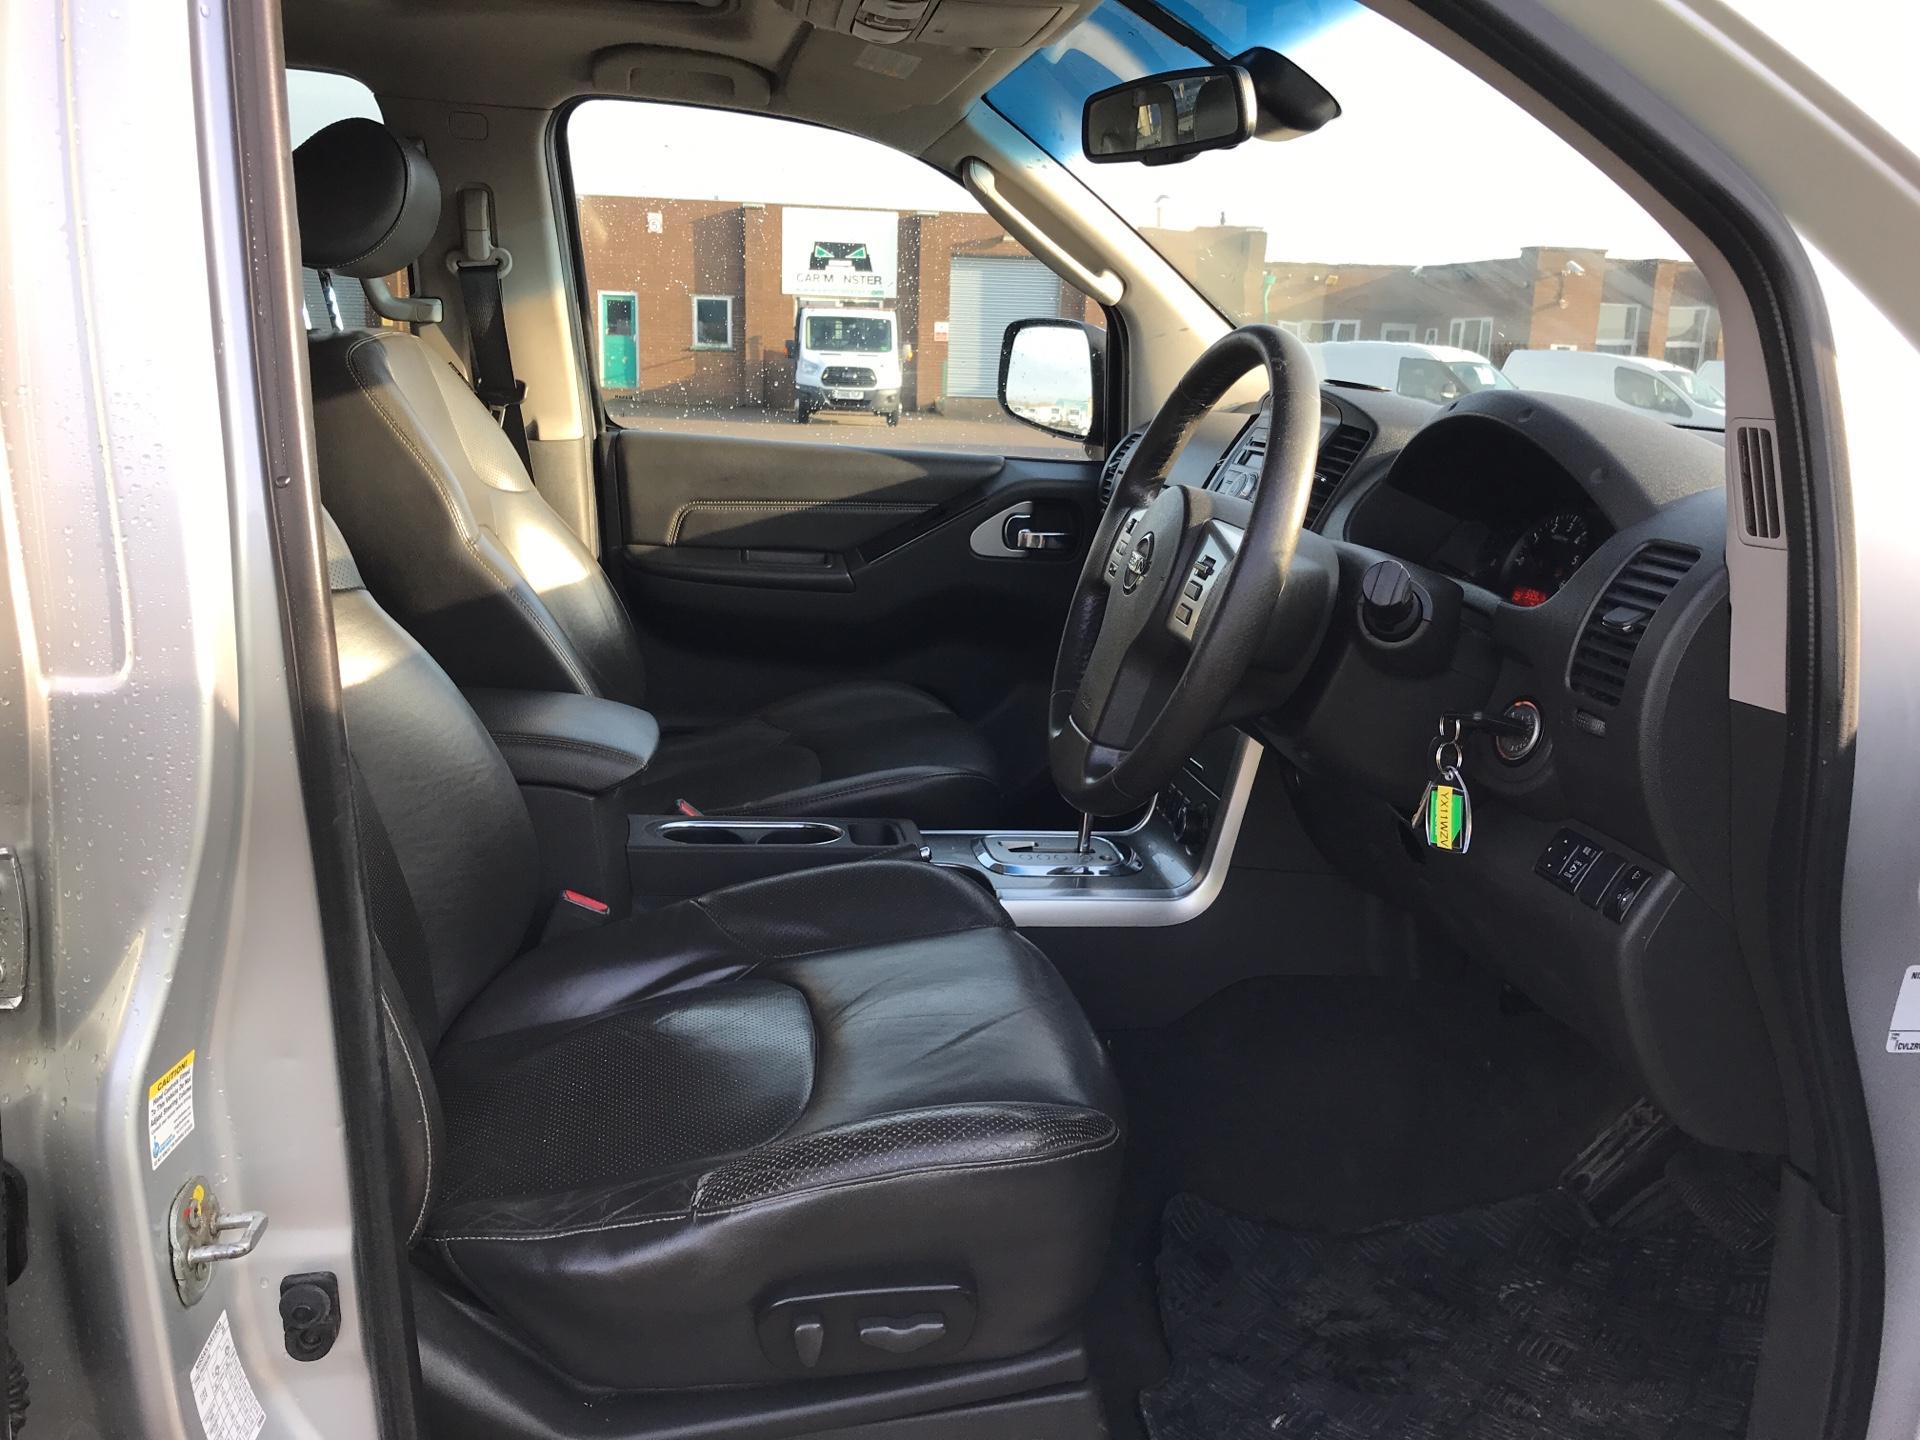 2011 Nissan Navara TEKNA 2.5 DCI 188 DOUBLE CAB AUTO EURO 4 (YX11WZV) Image 9